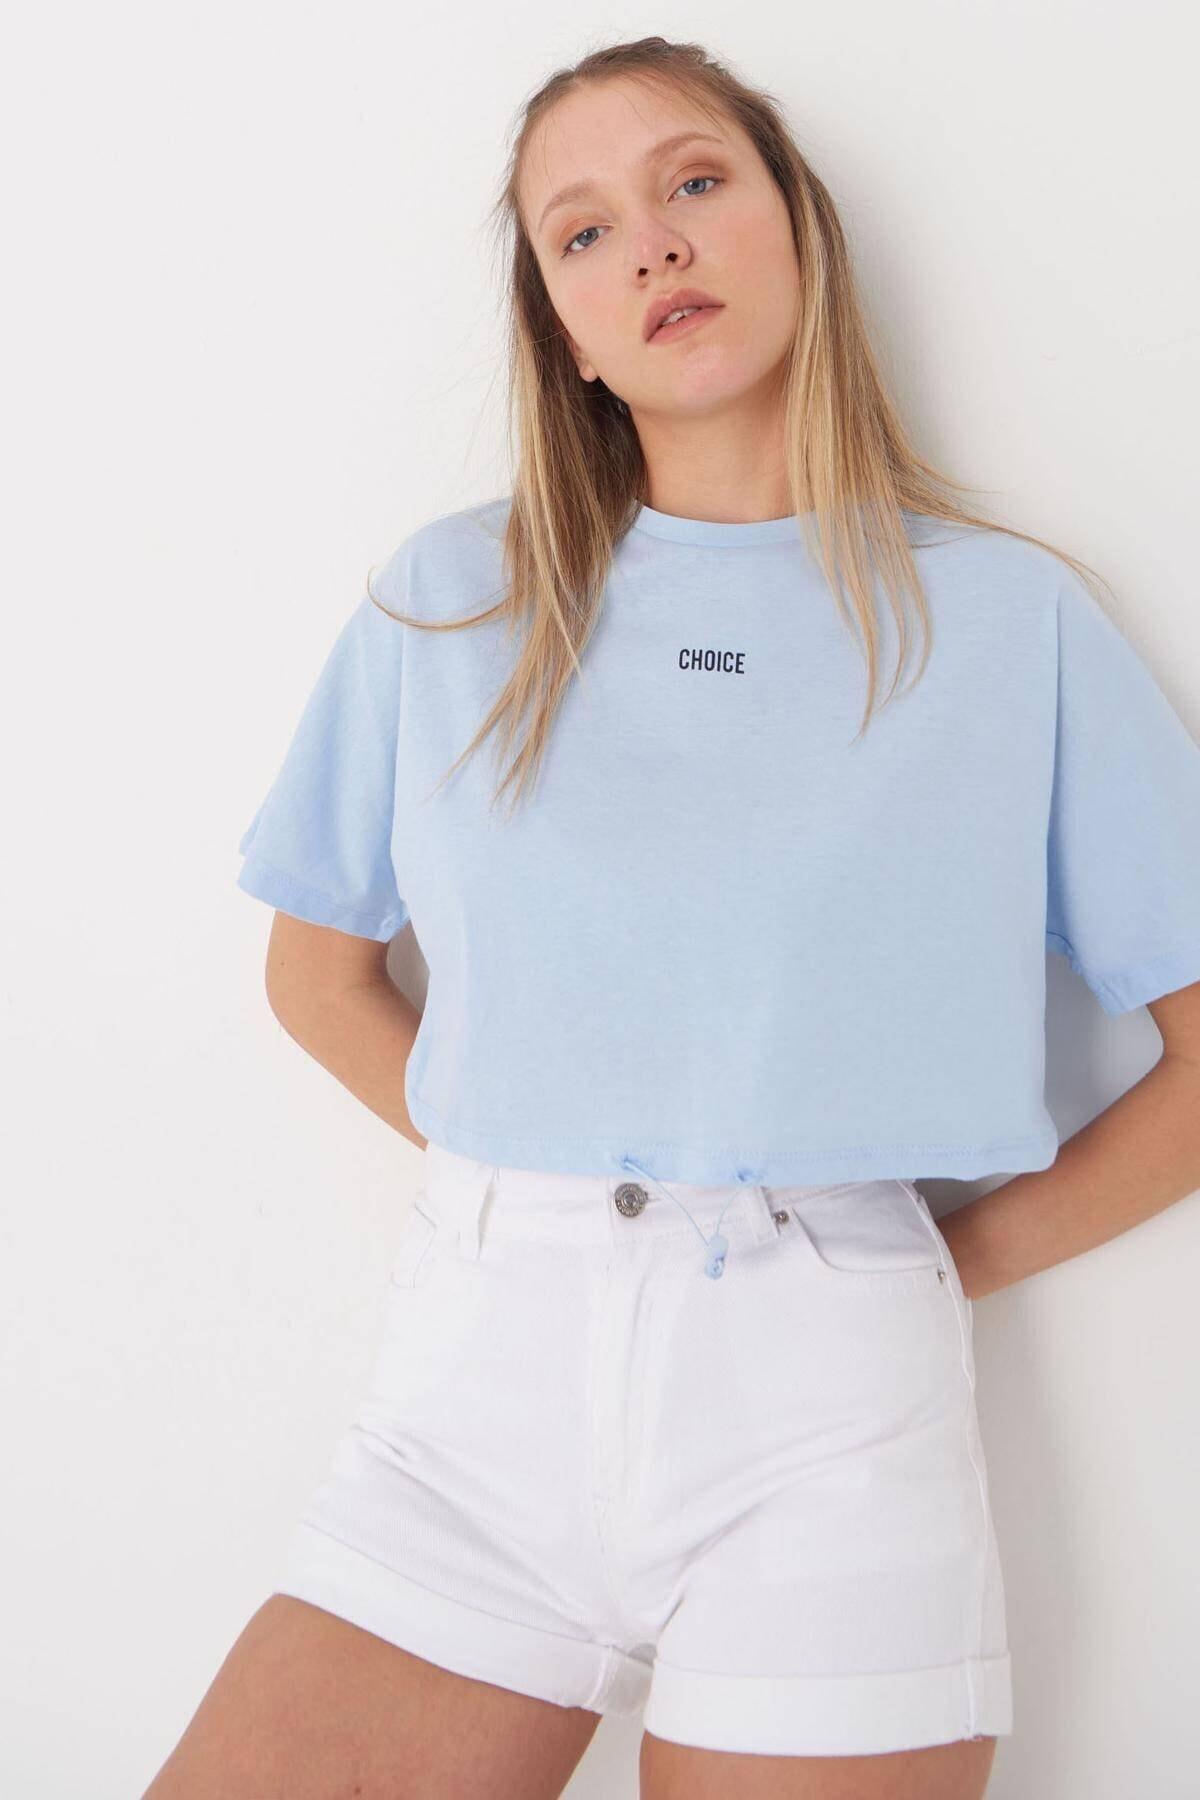 Kadın Buz Mavi Choıce Yazılı Tişört P0874 - L13 Adx-0000021844